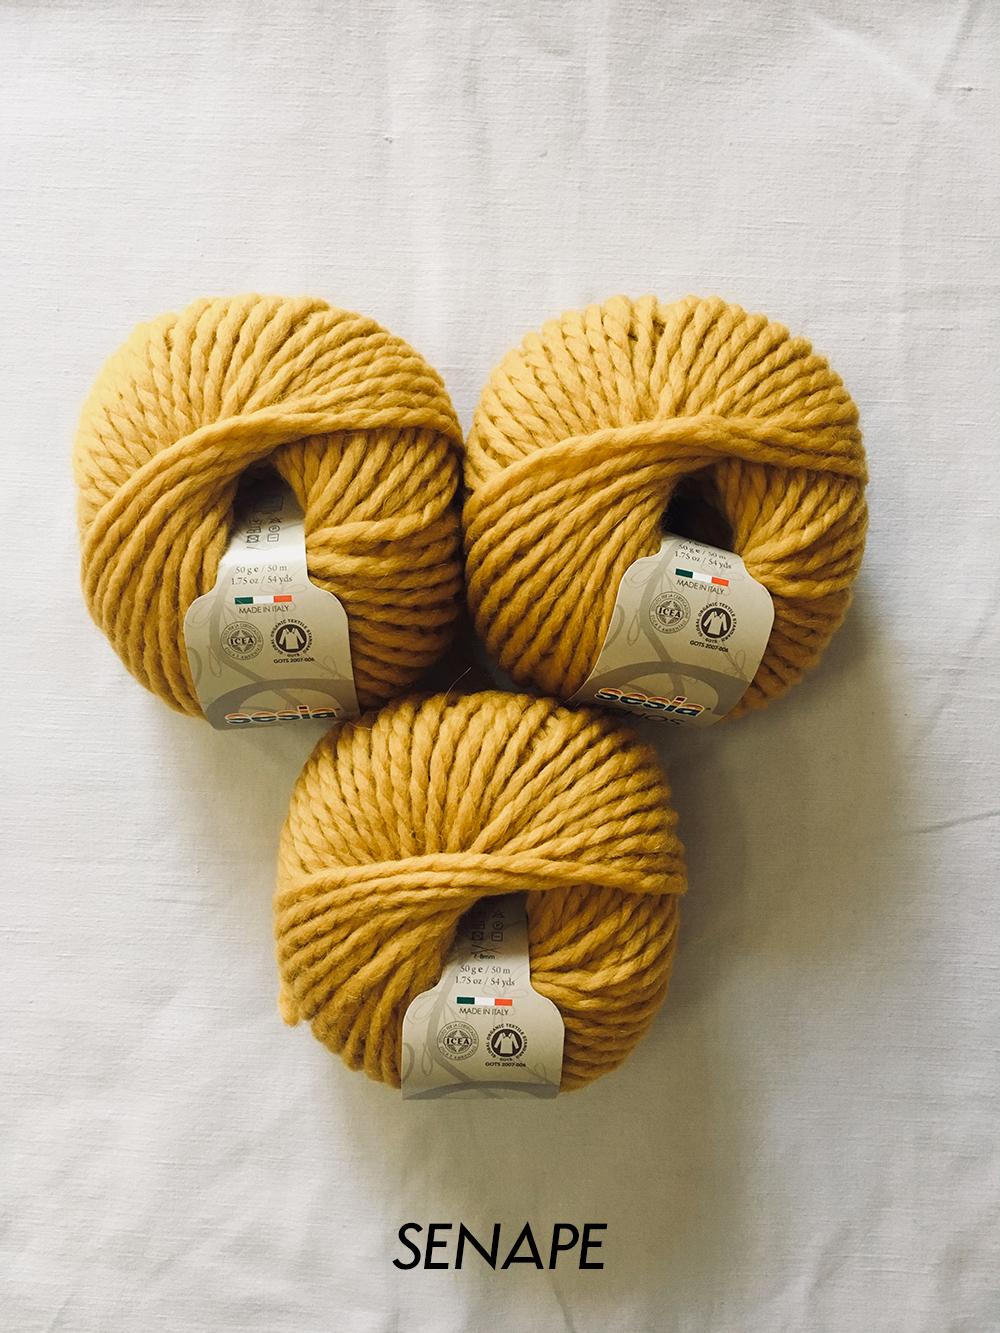 sesia_echos_senape_229_wool_done_knitting.jpg